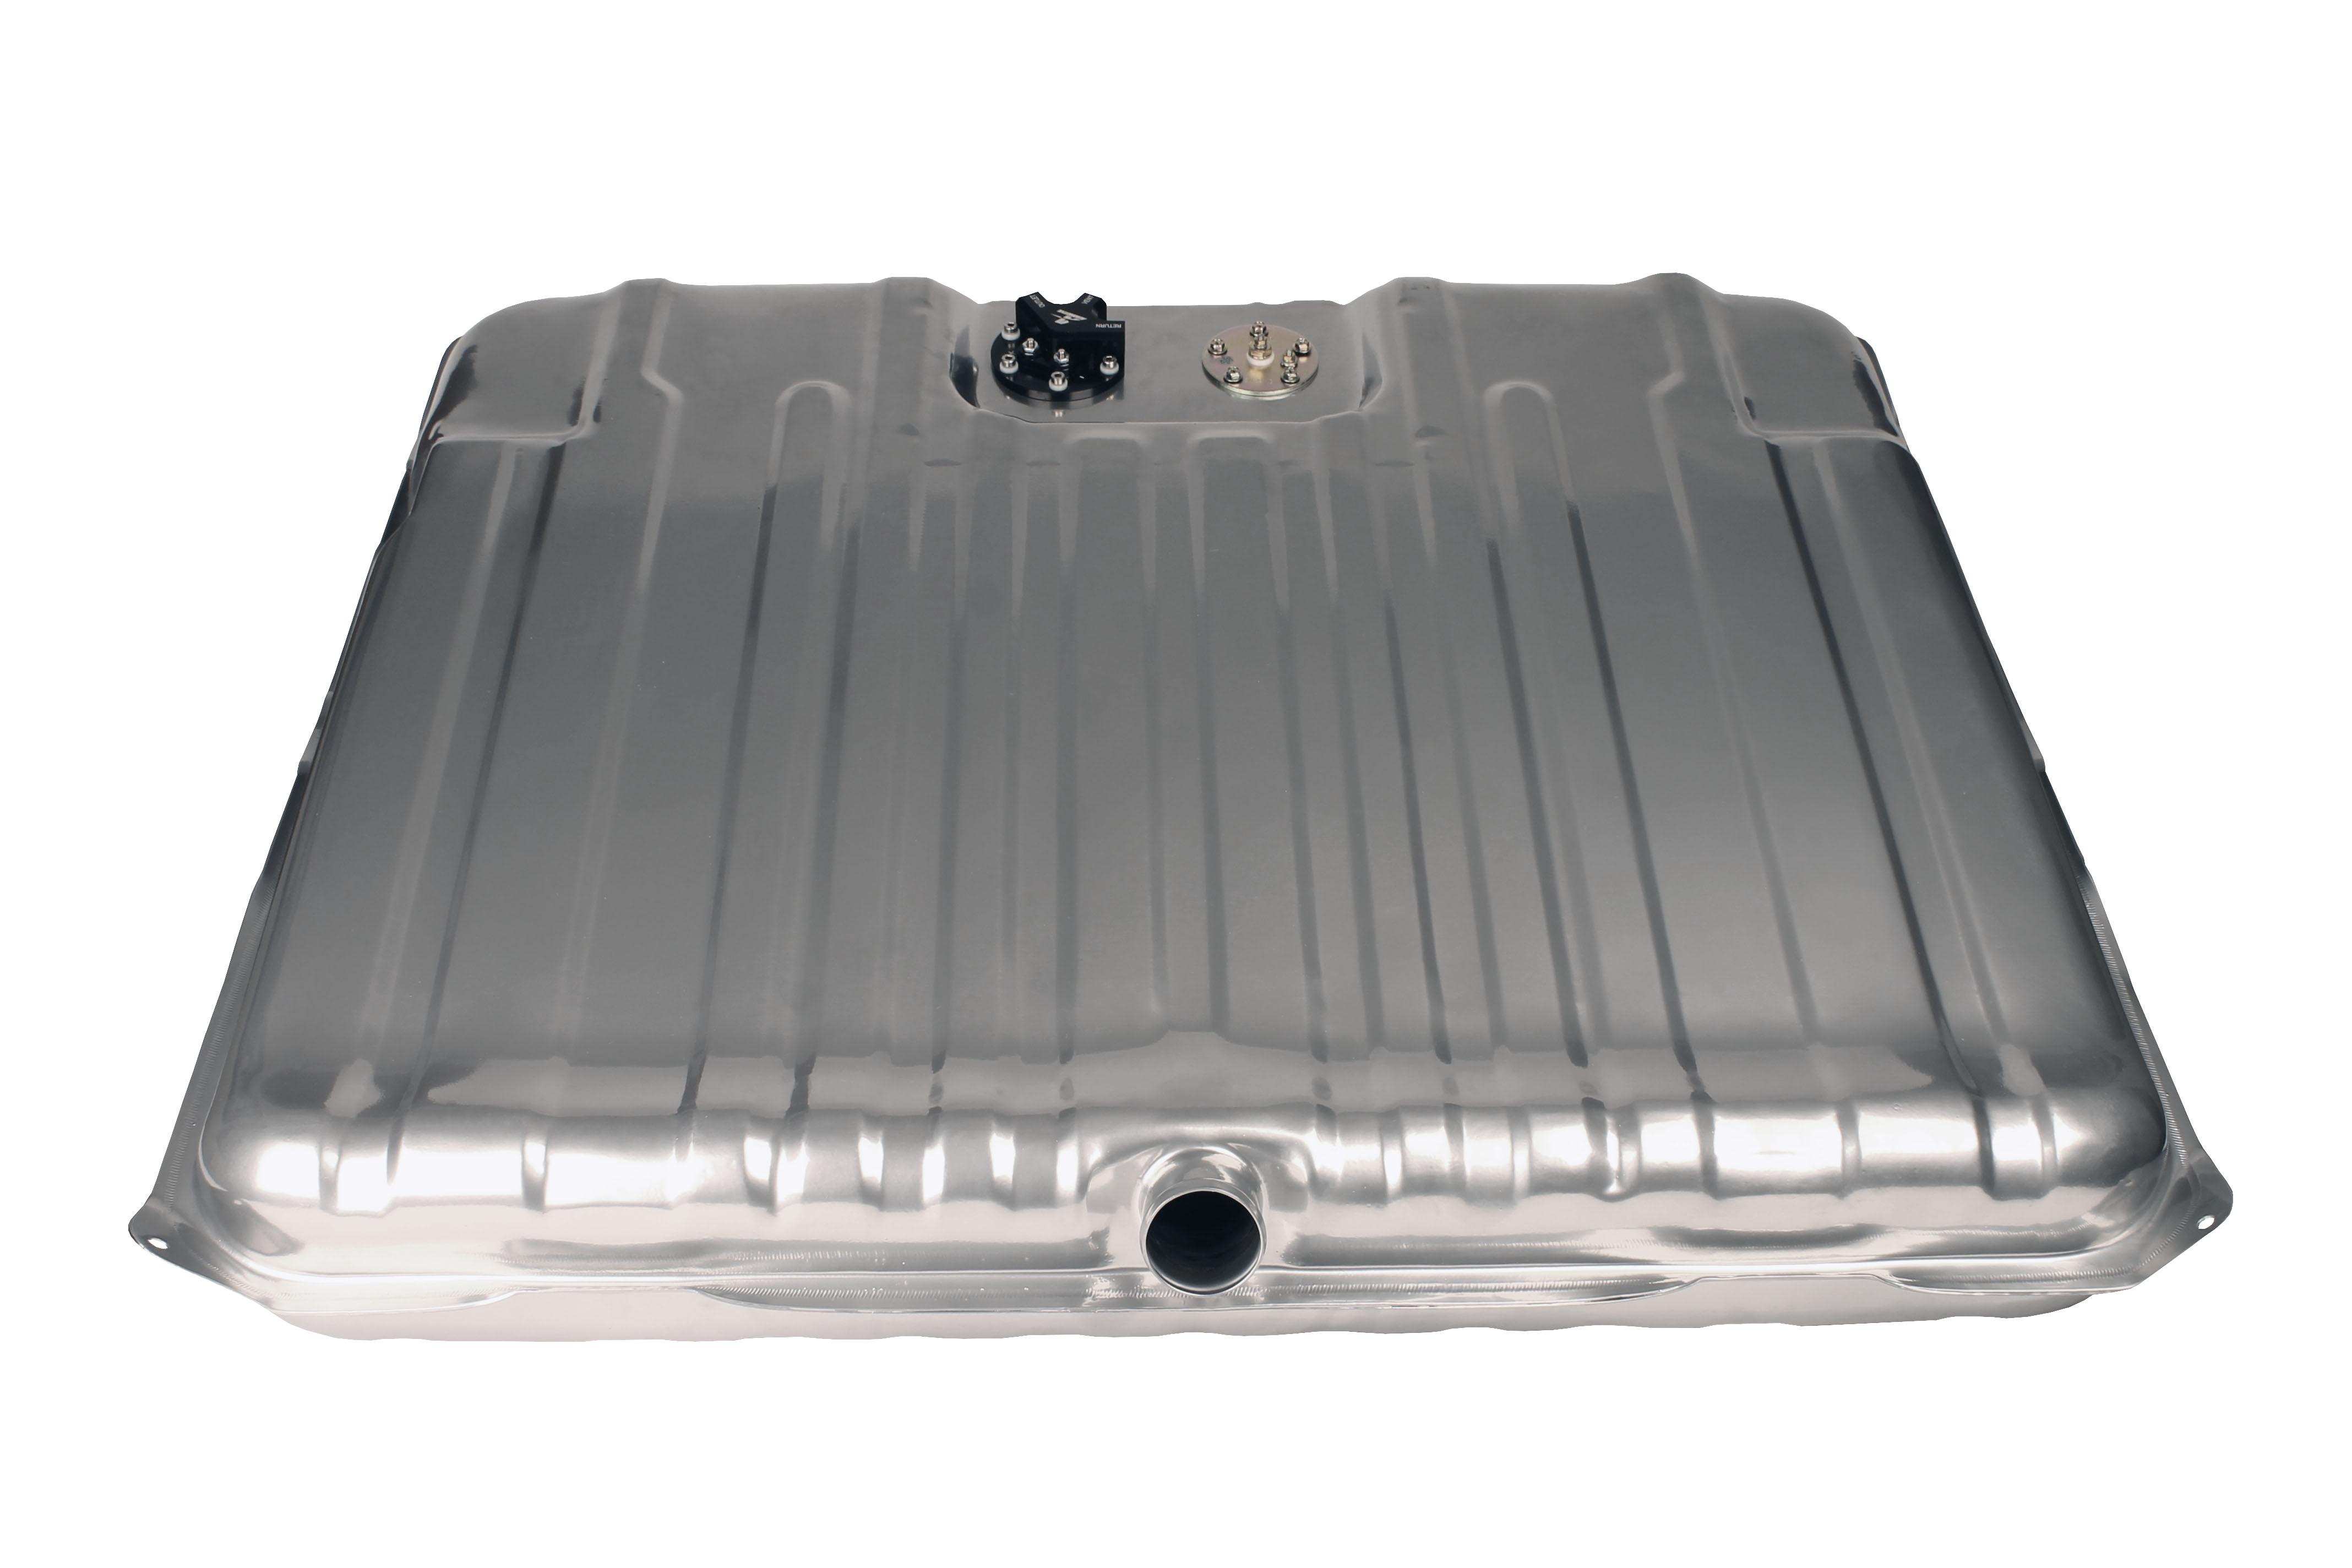 64-67 Buick Skylark Fuel Tank